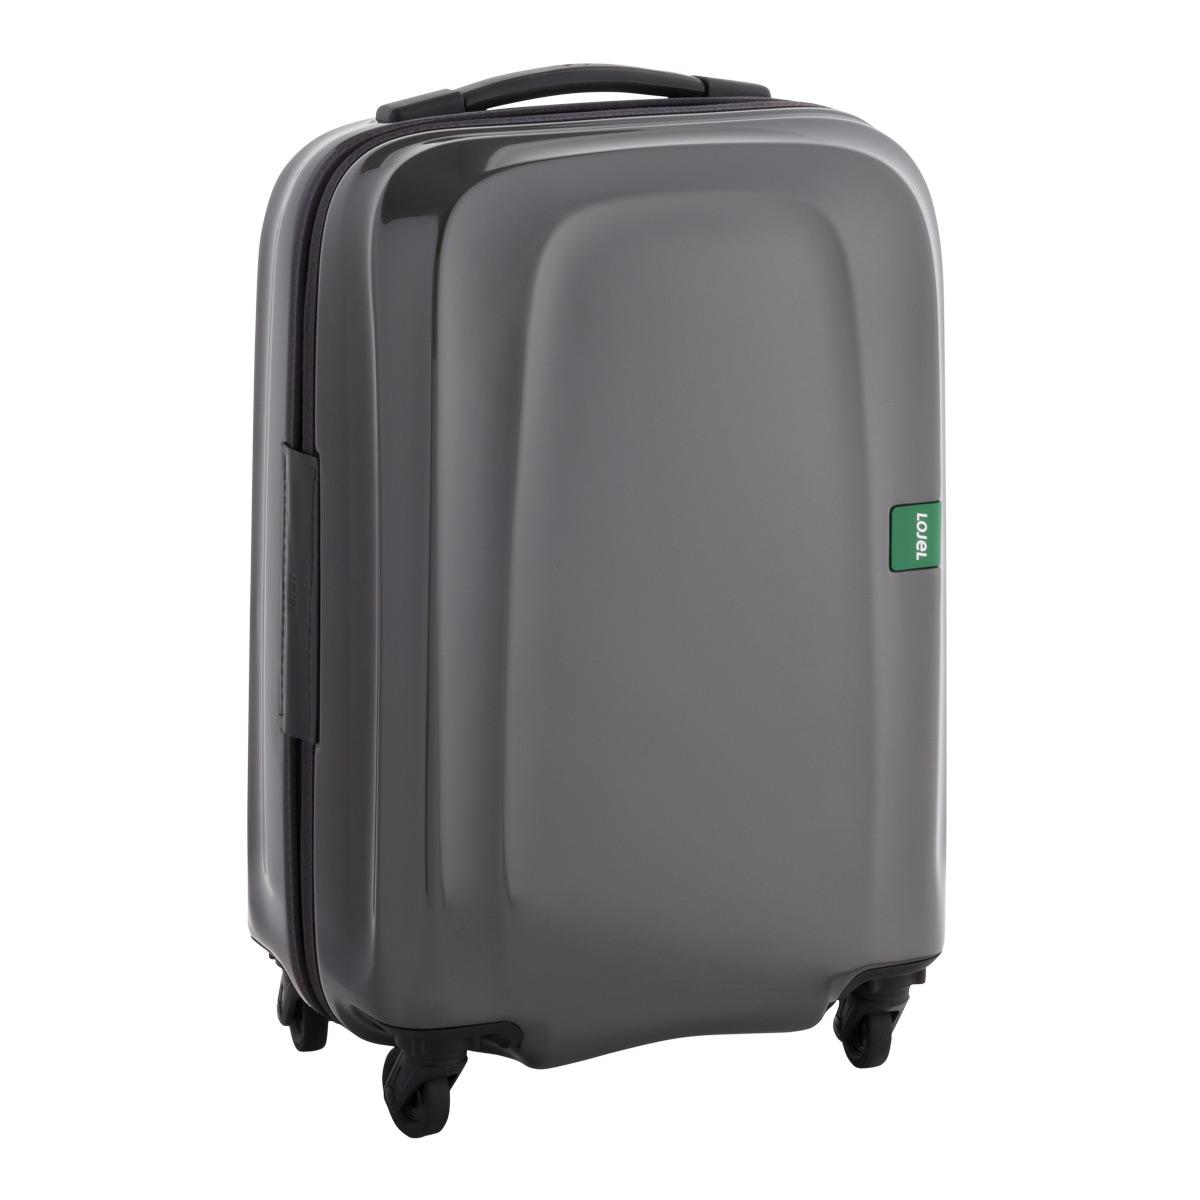 Lightweight 4-Wheeled Luggage